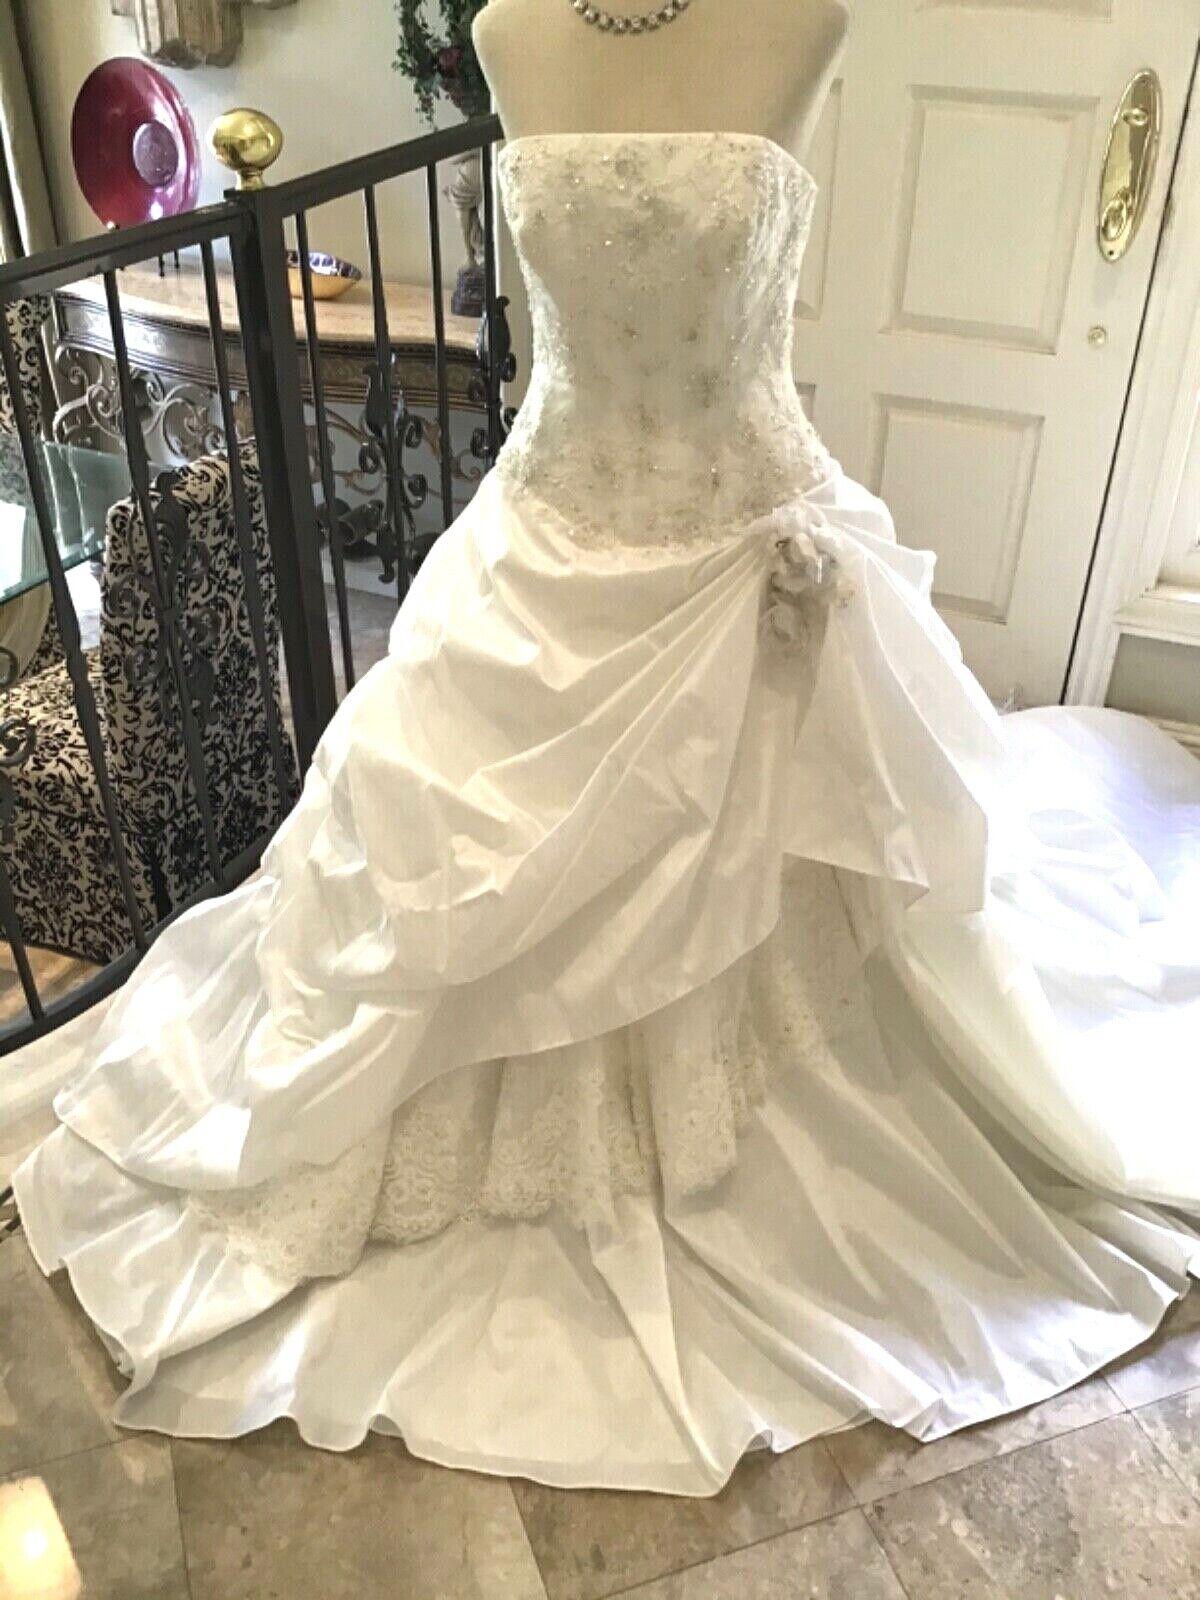 Allure Corset Wedding Dress Bridal Gown Diamond White taffeta lace up back 10